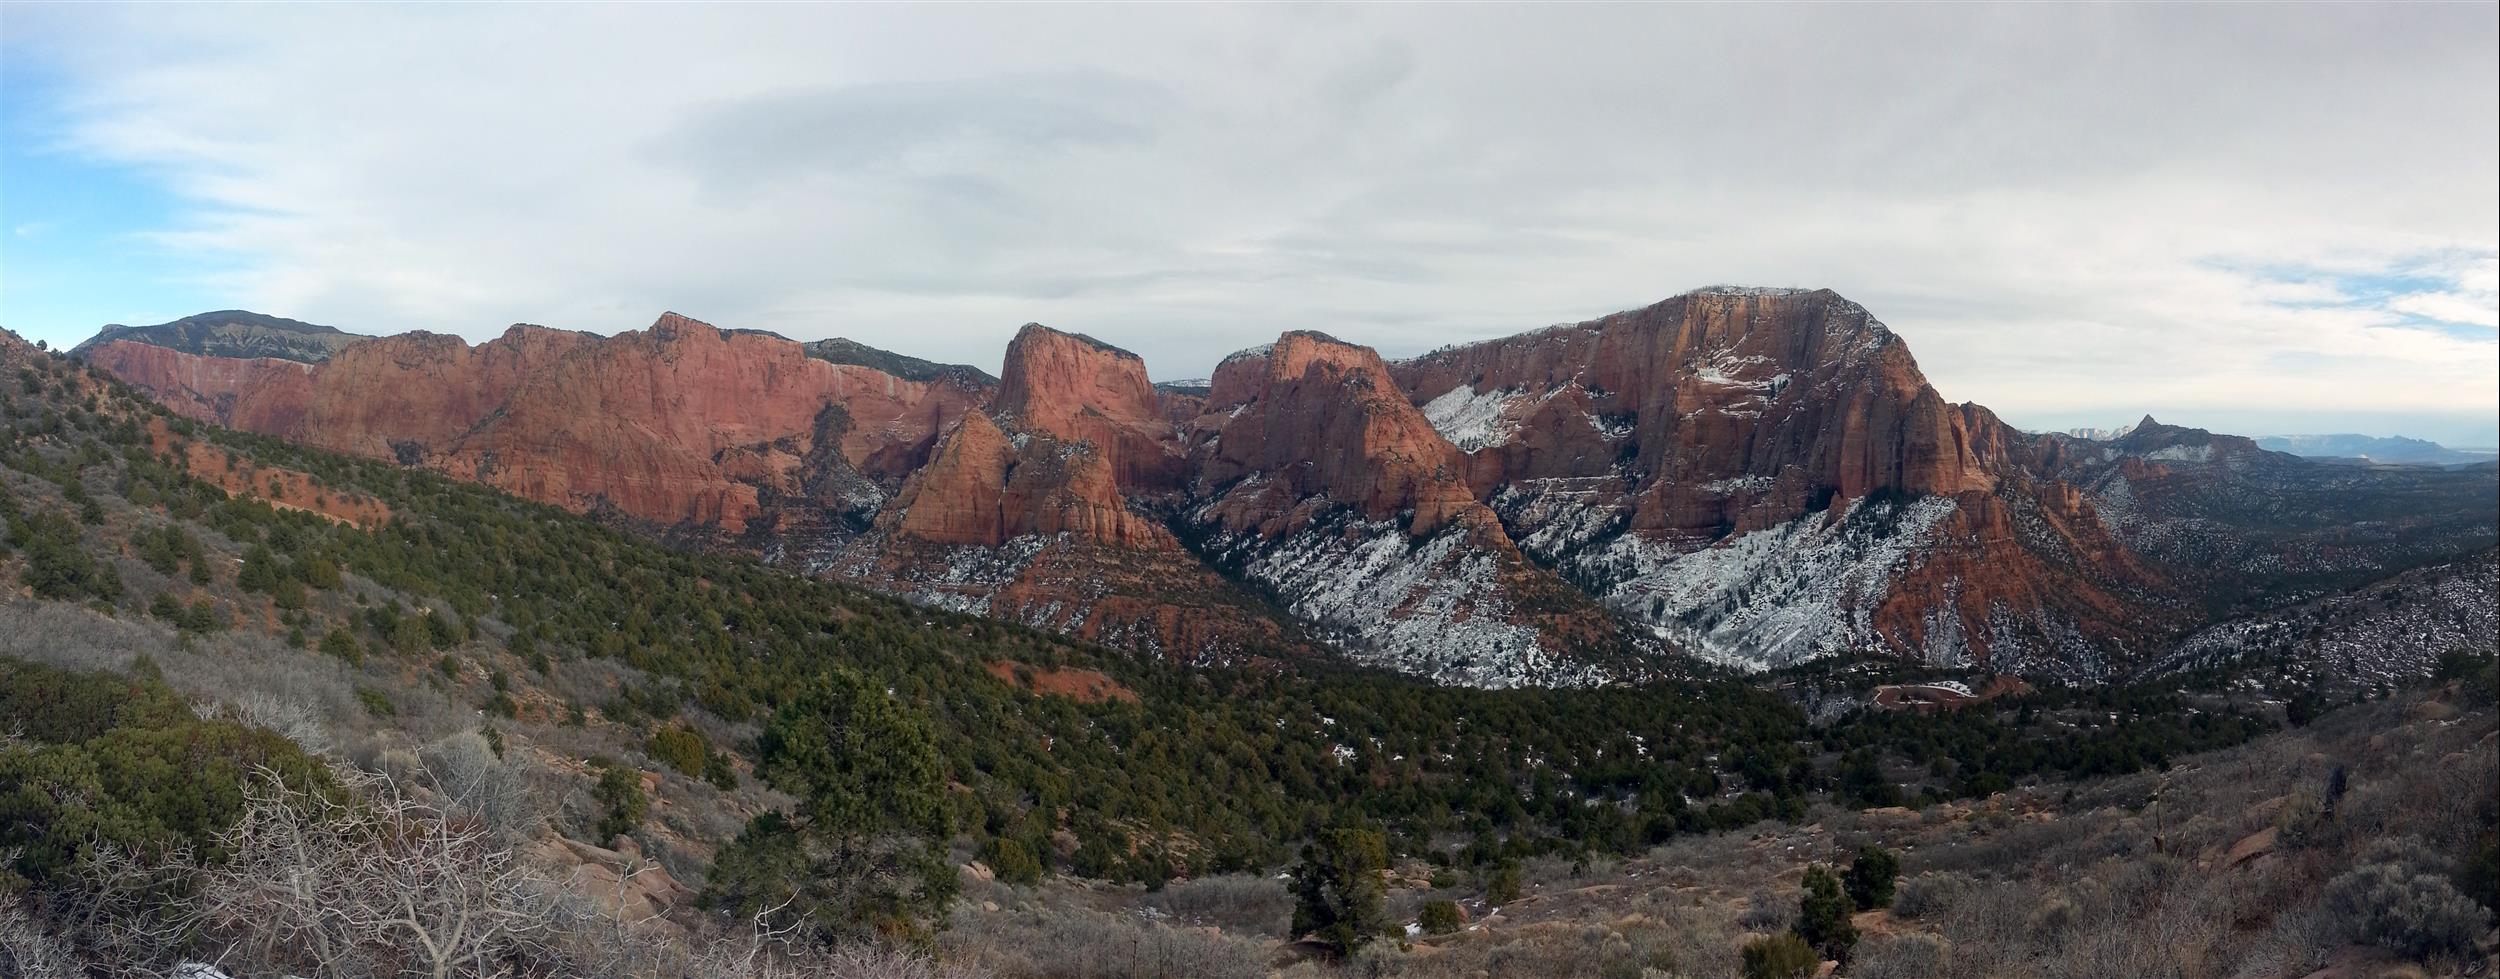 Kolob Canyons, Zion N.P.